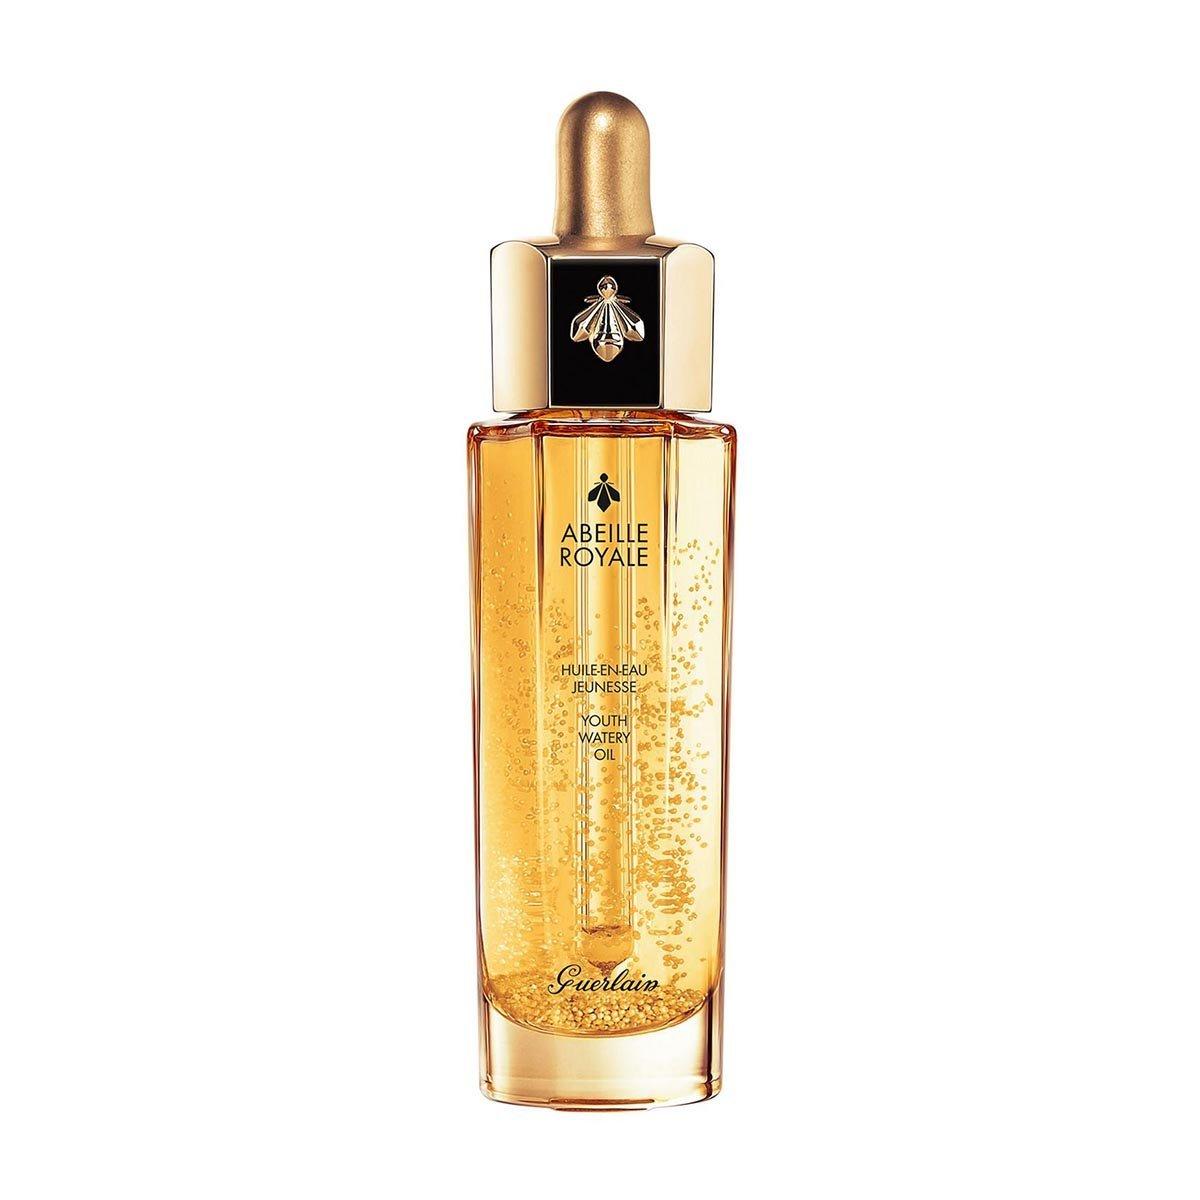 Guerlain Body Tonic - 50 ml